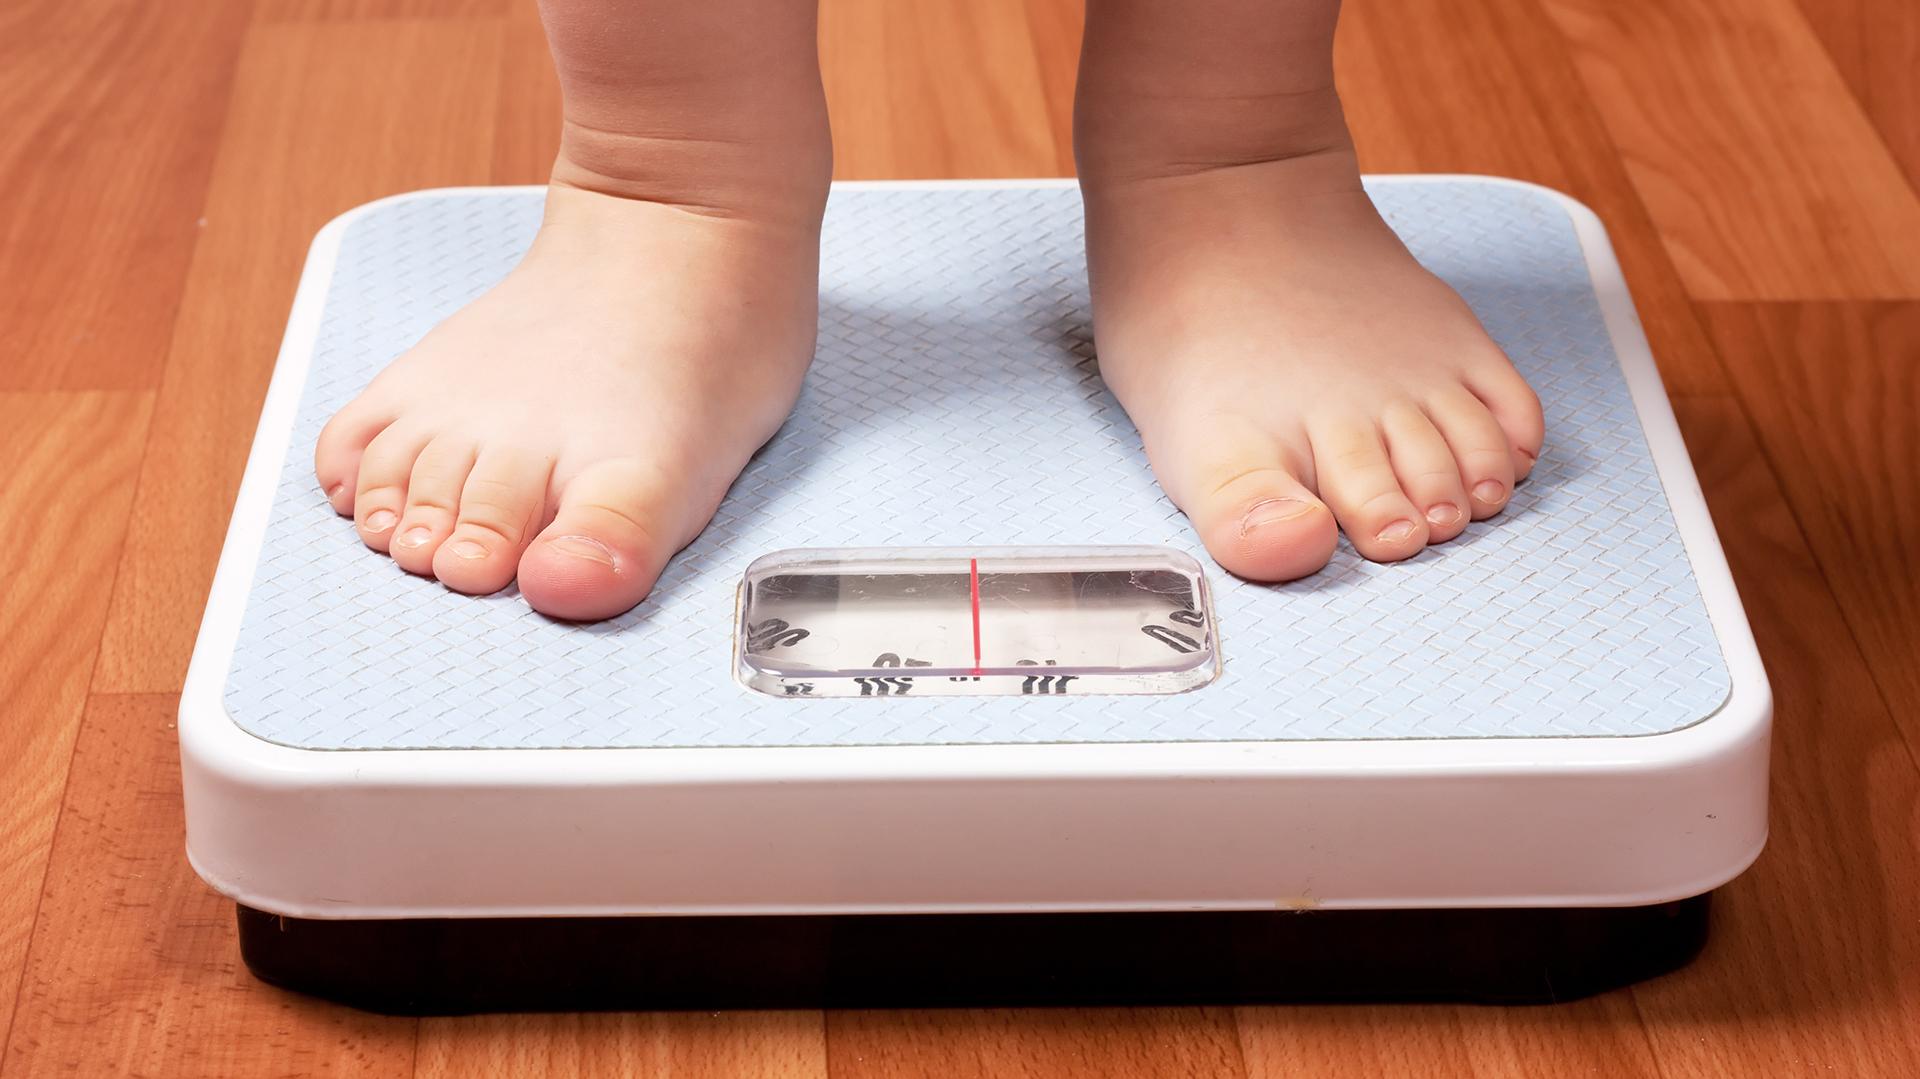 La epidemia de obesidad infantil en la Argentina preocupa a la OMS y ocupa la agenda de la Asamblea Mundial de la Salud